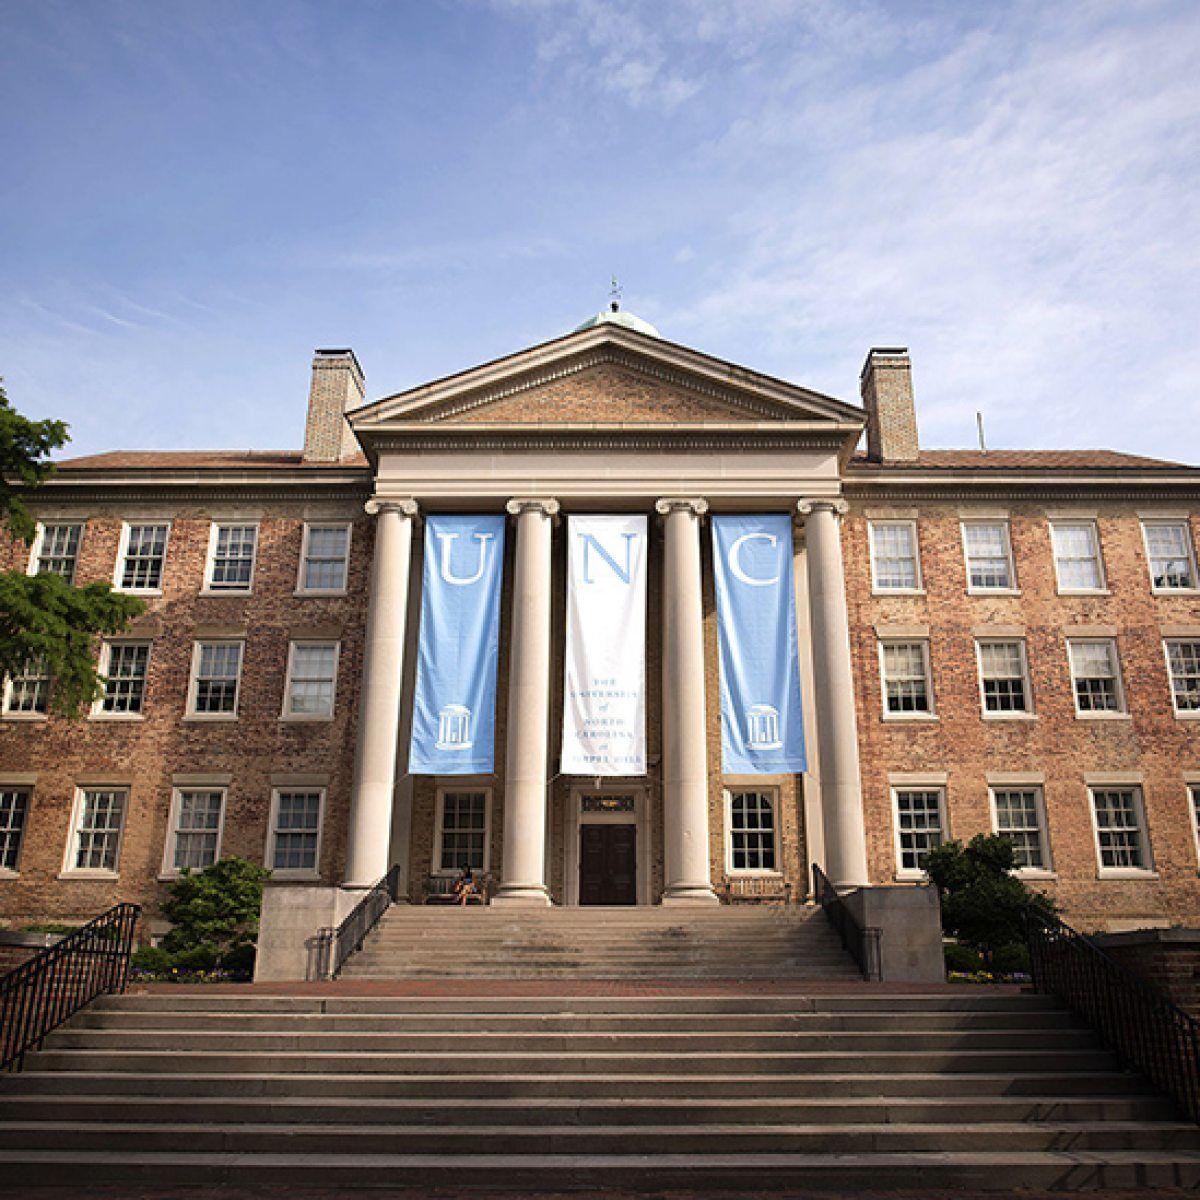 Timeless Traditions Unc Chapel Hill Unc Chapel Hill Chapel Hill University Chapel Hill North Carolina